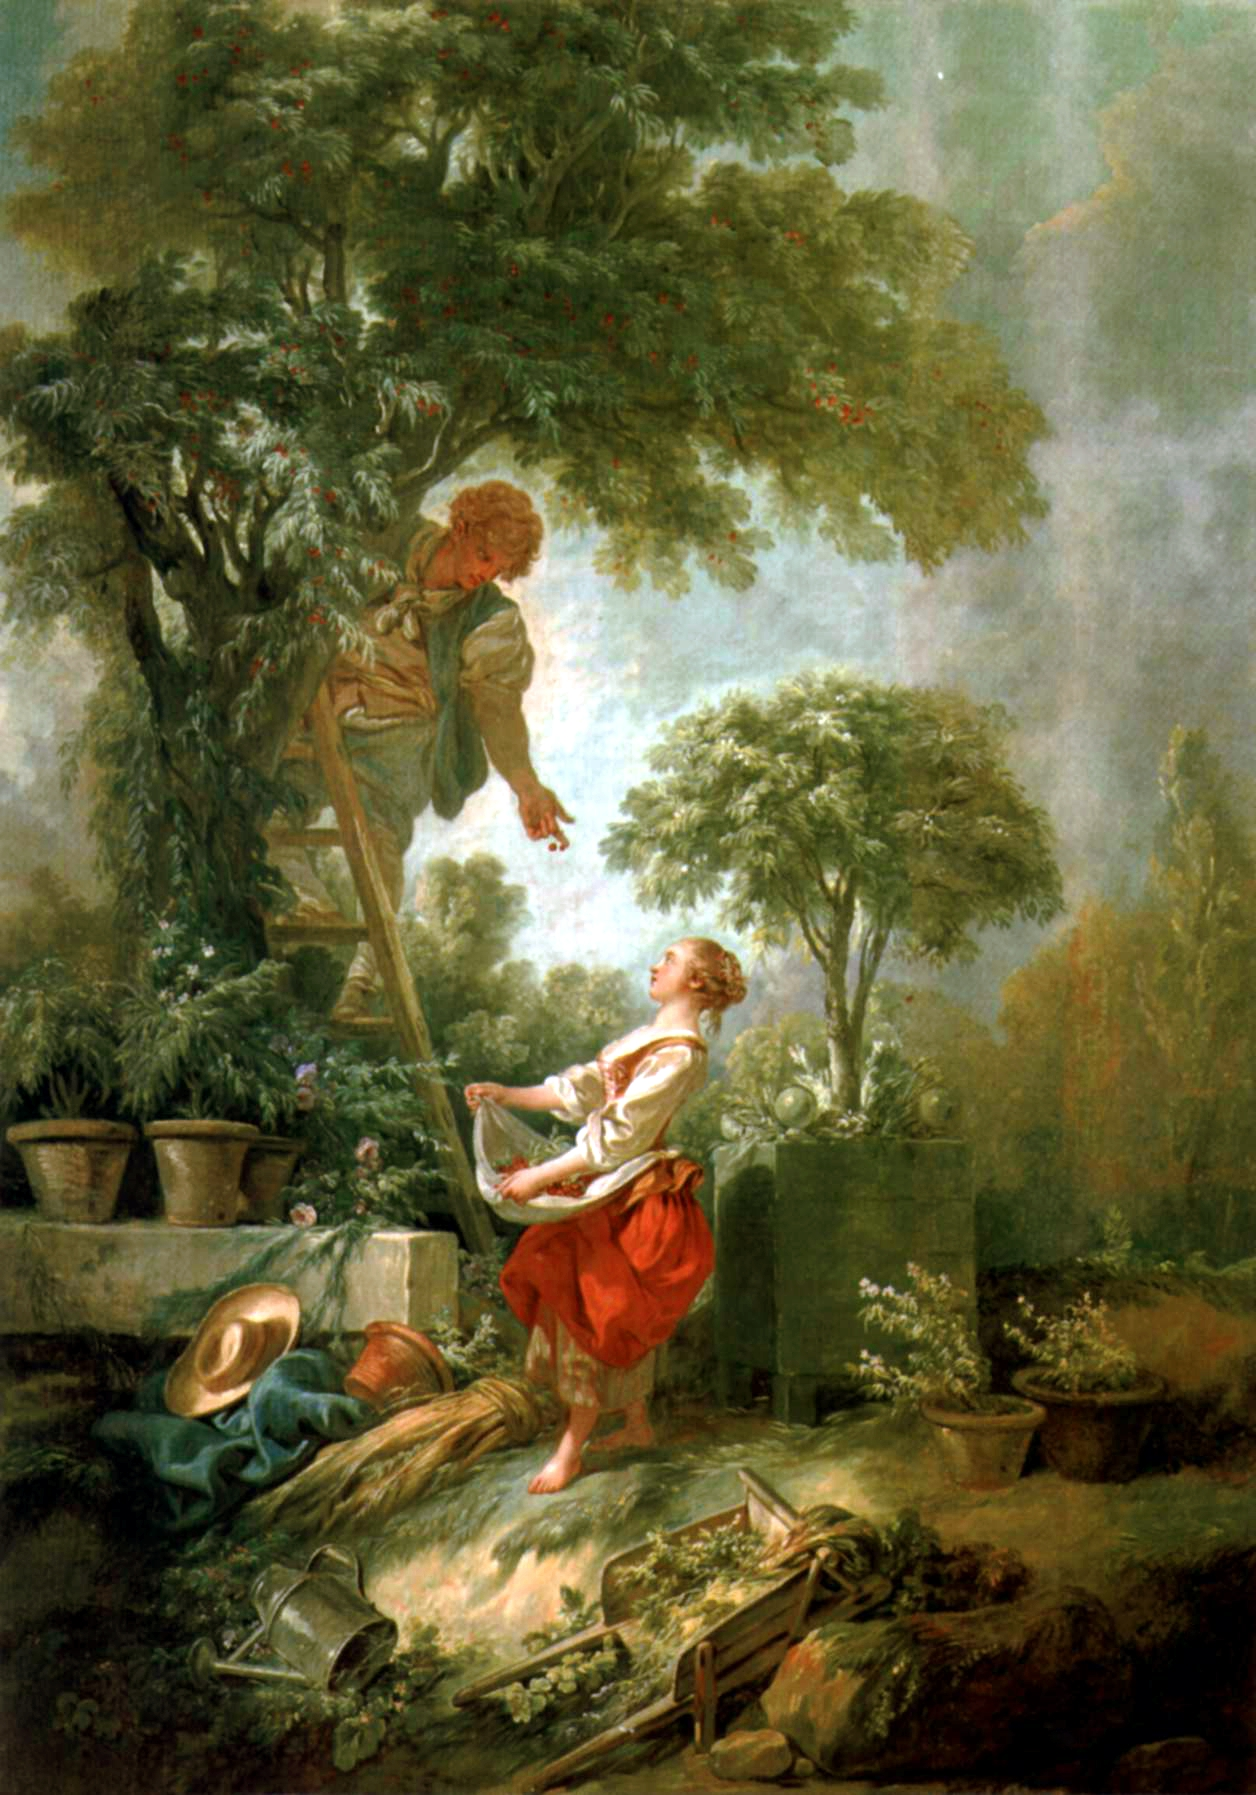 Man Vs Nature Painting